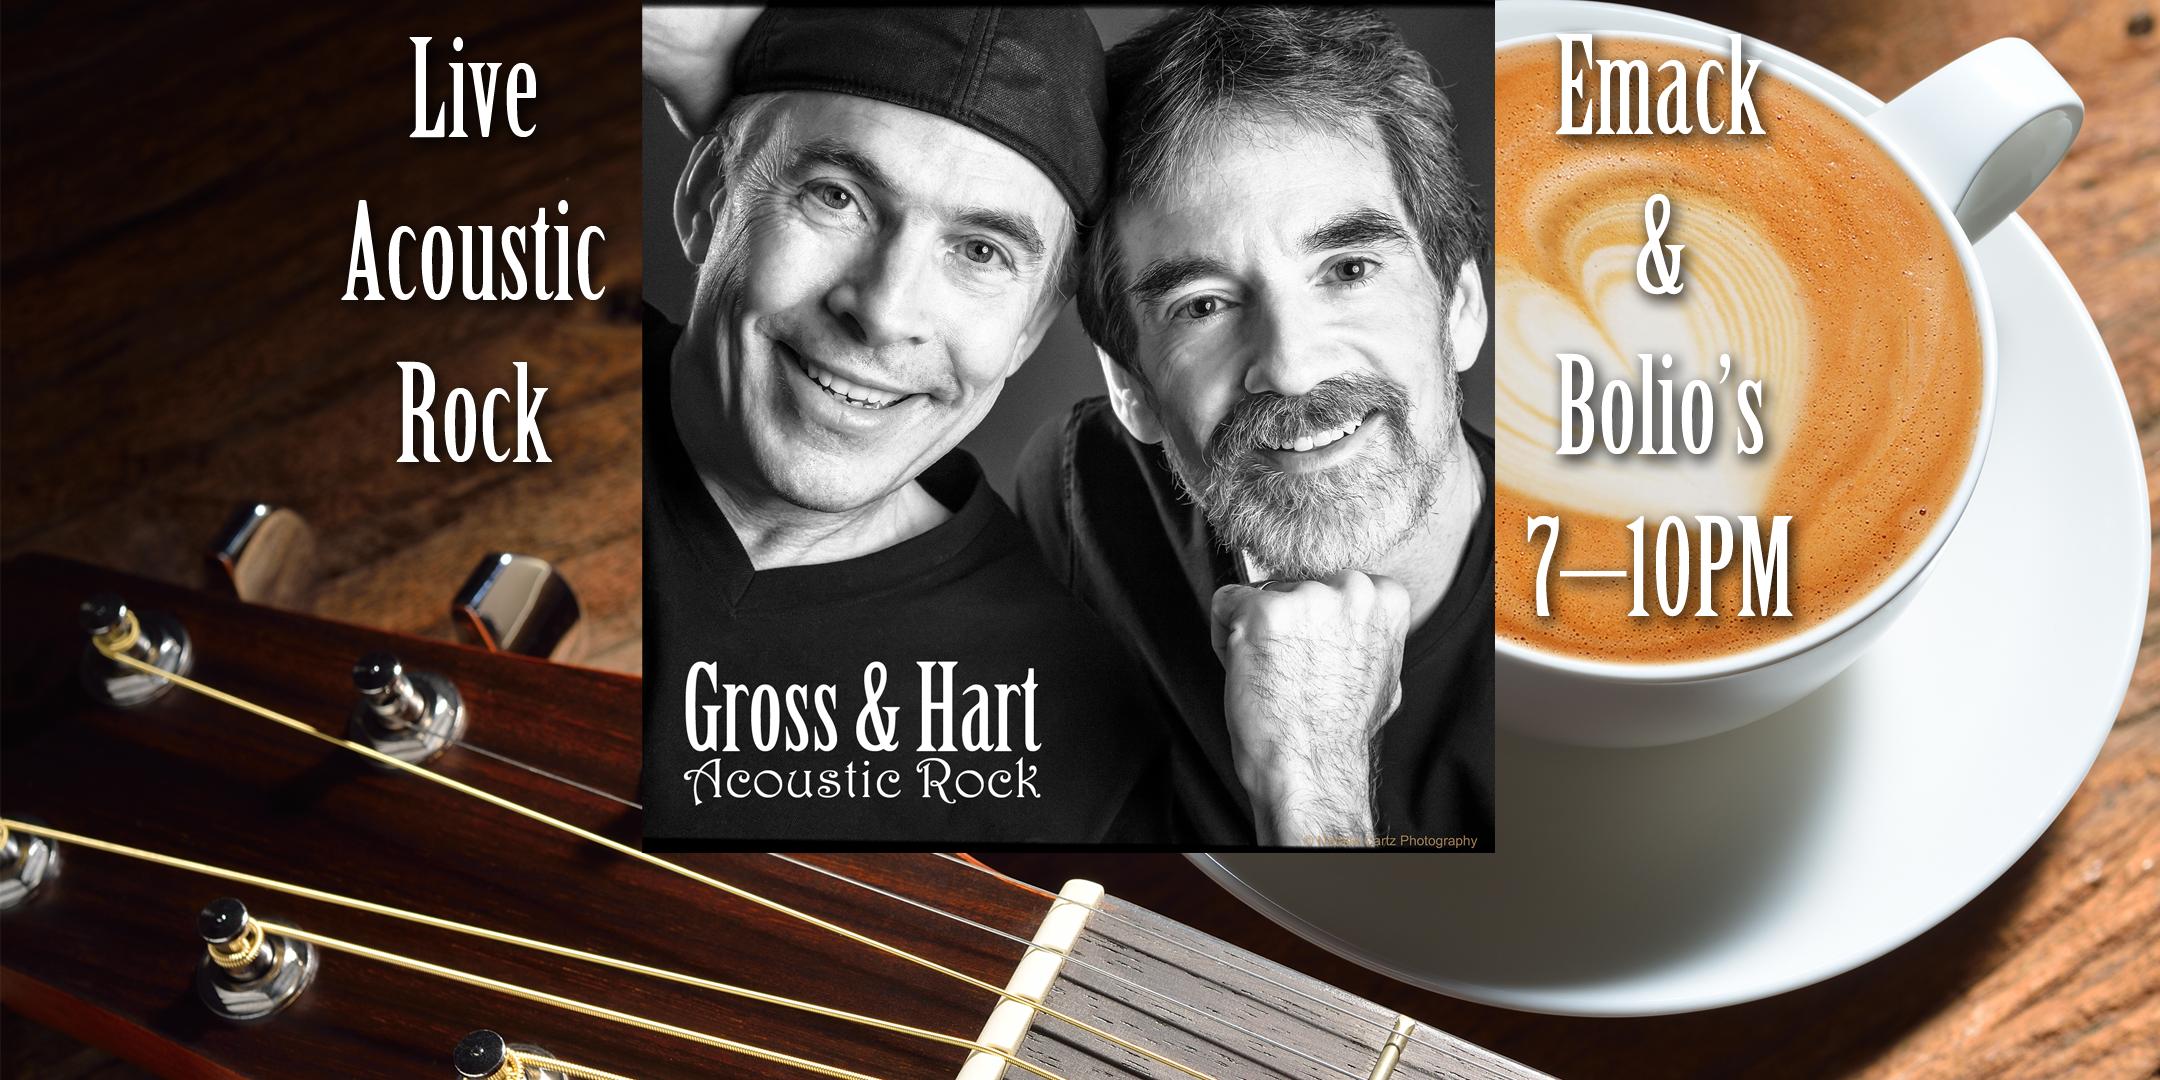 Gross & Hart @ Emack & Bolio's